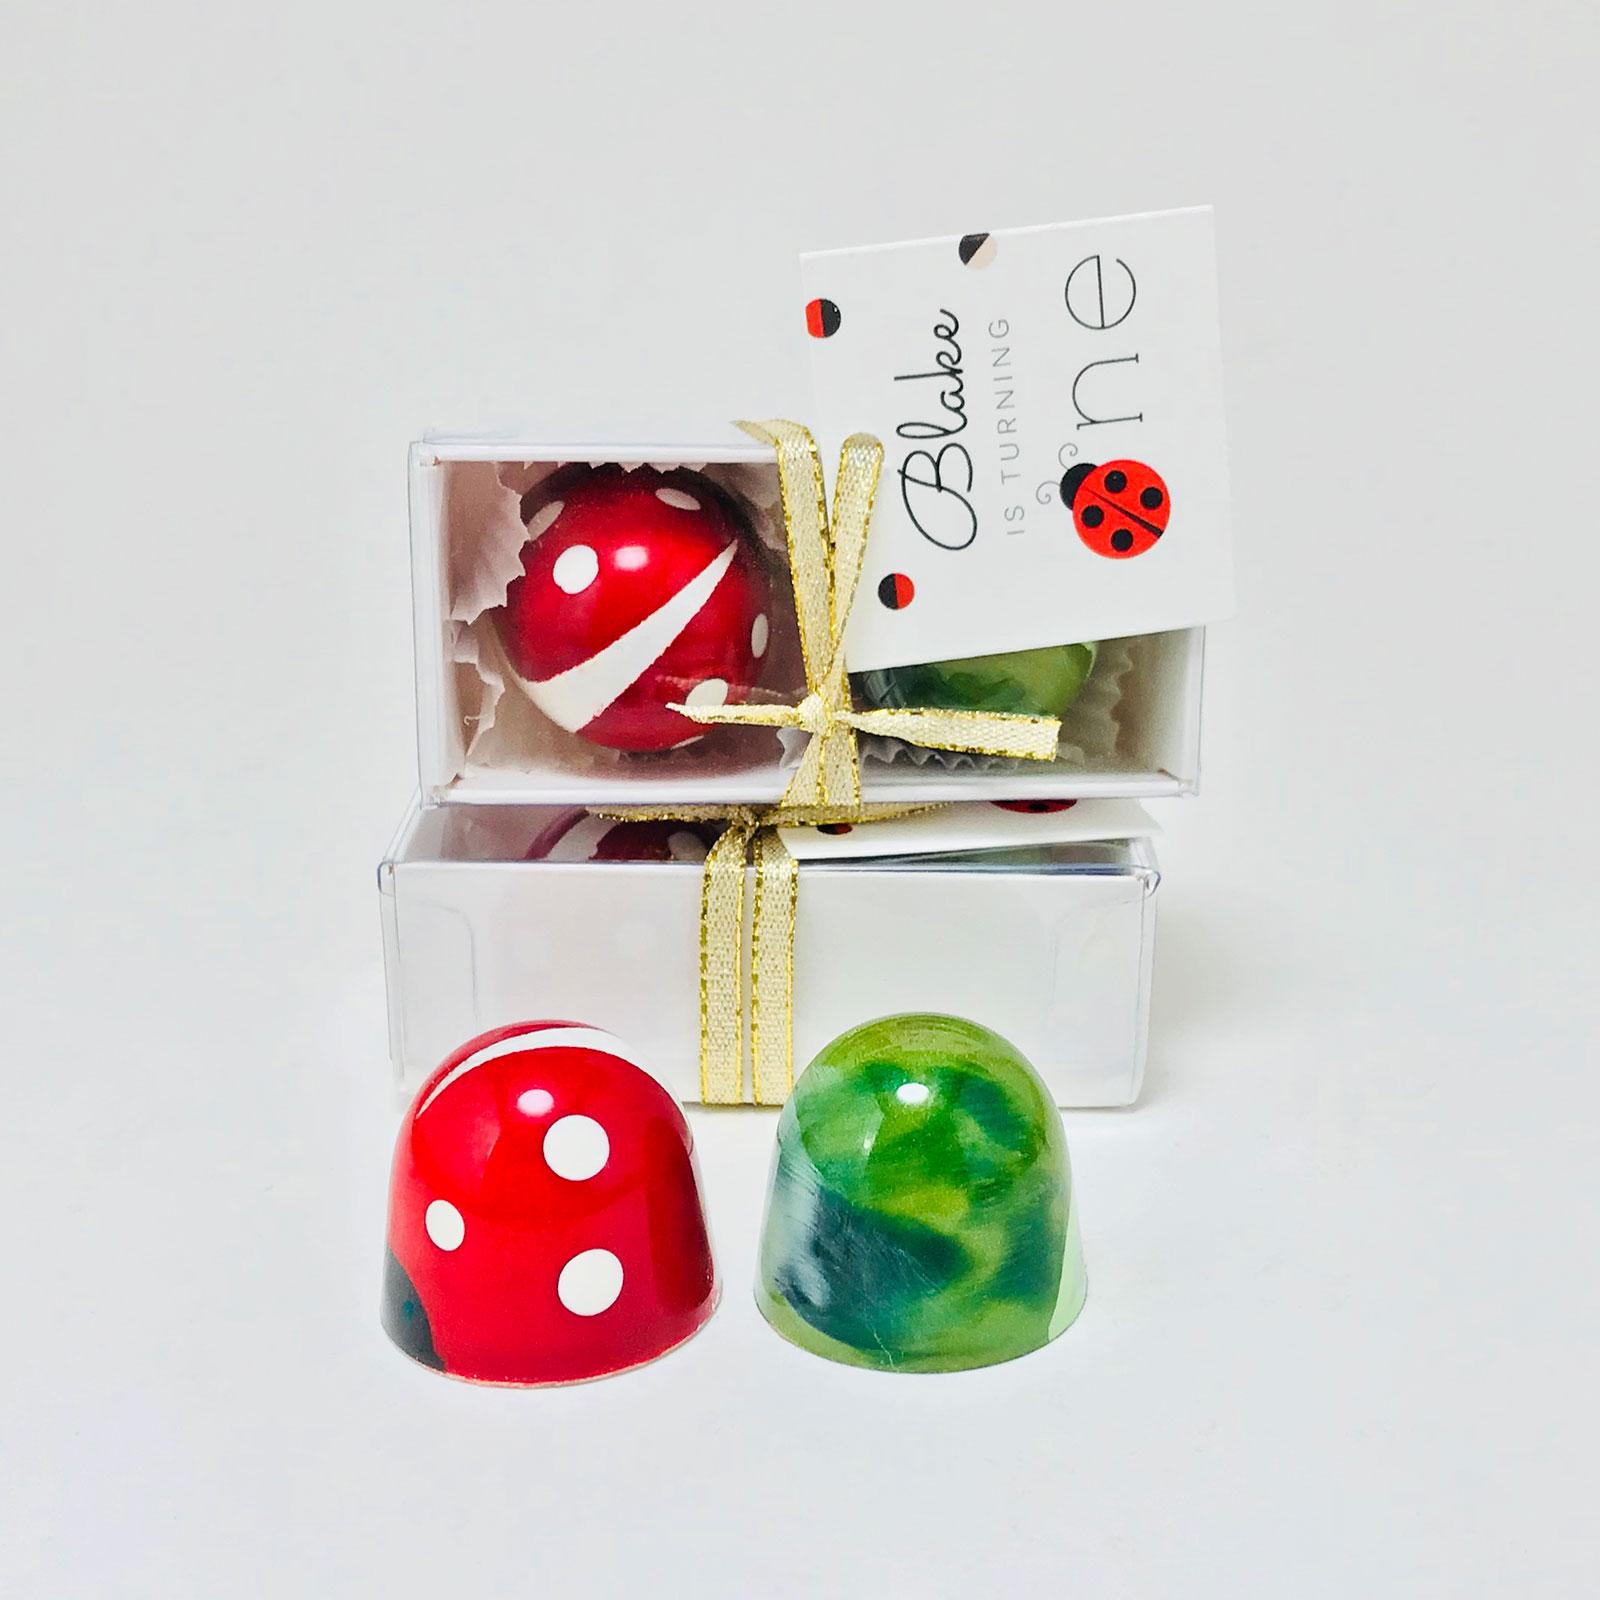 goodgood-ladybug-party-favor.jpg